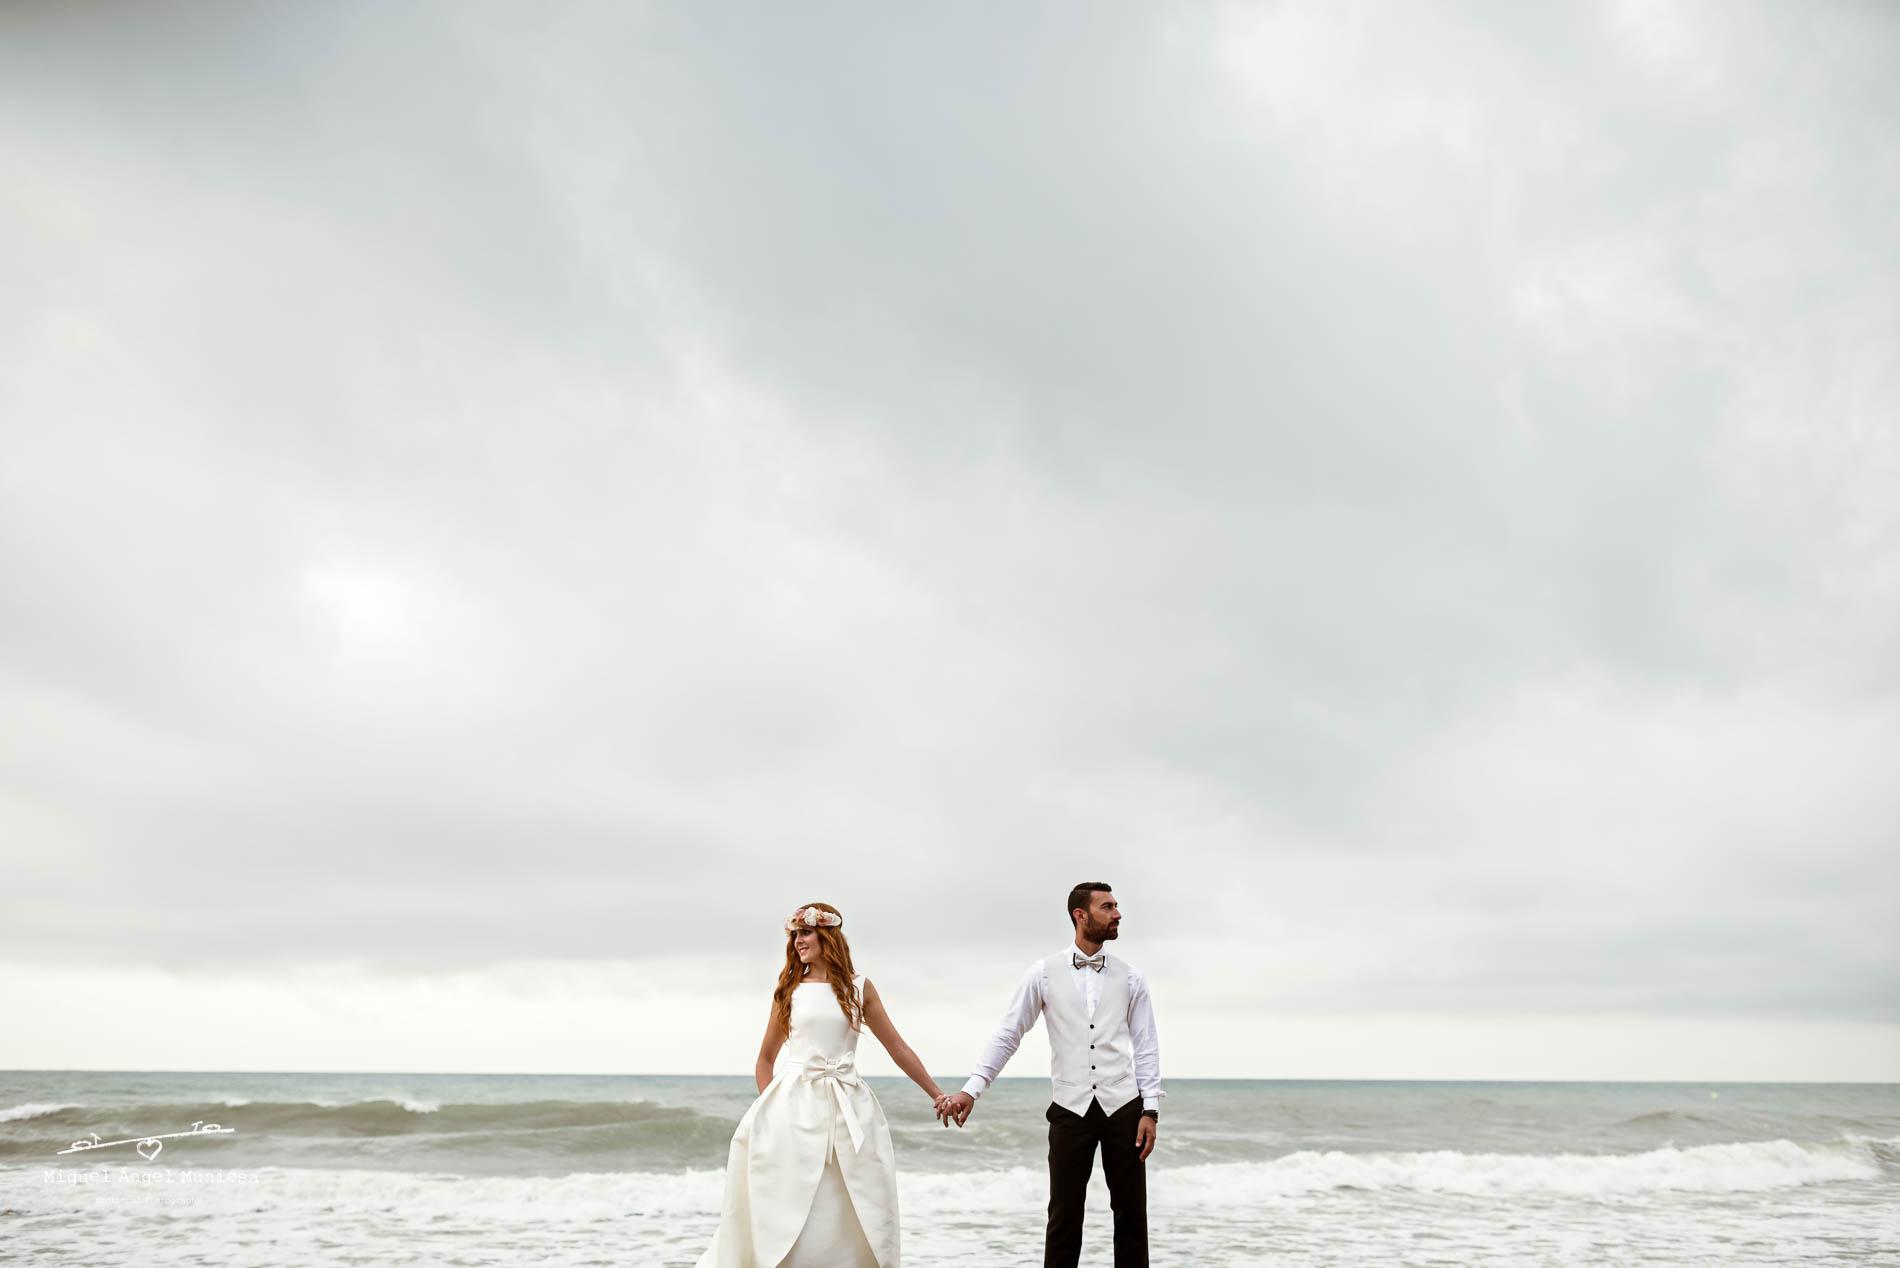 boda, fotografia de boda, boda zaragoza, fotografia, wedding, wedding photography, miguel angel muniesa, fotografo boda Zaragoza, fotografo boda, destination wedding_ 0002